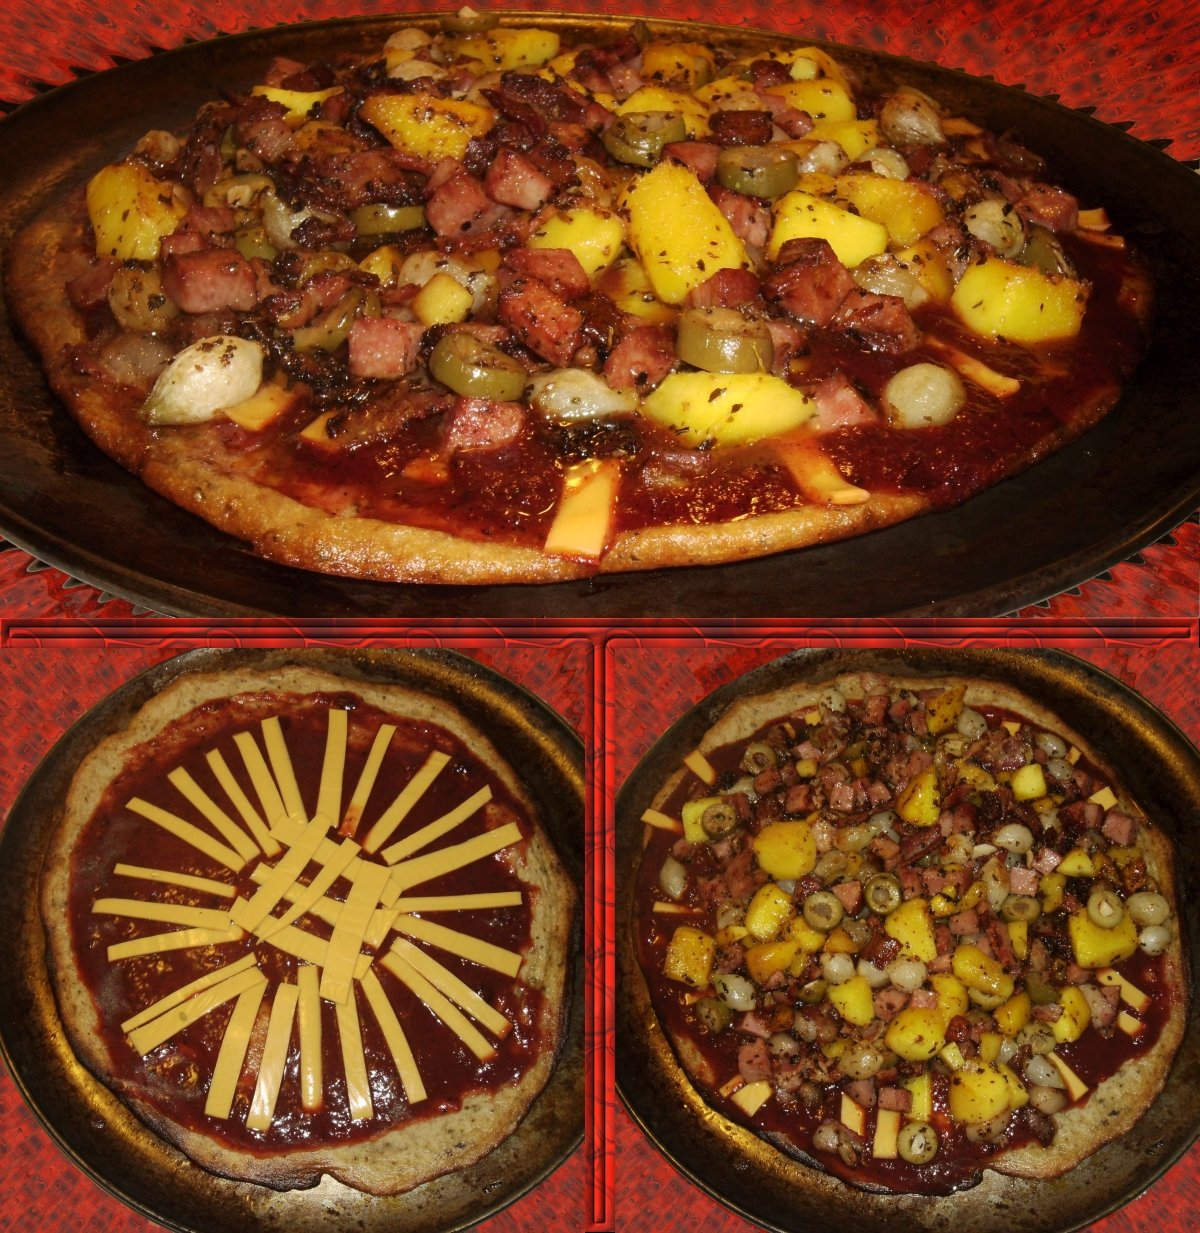 criminara bacon turkey ham mango green olive pizza by windthin on deviantart. Black Bedroom Furniture Sets. Home Design Ideas